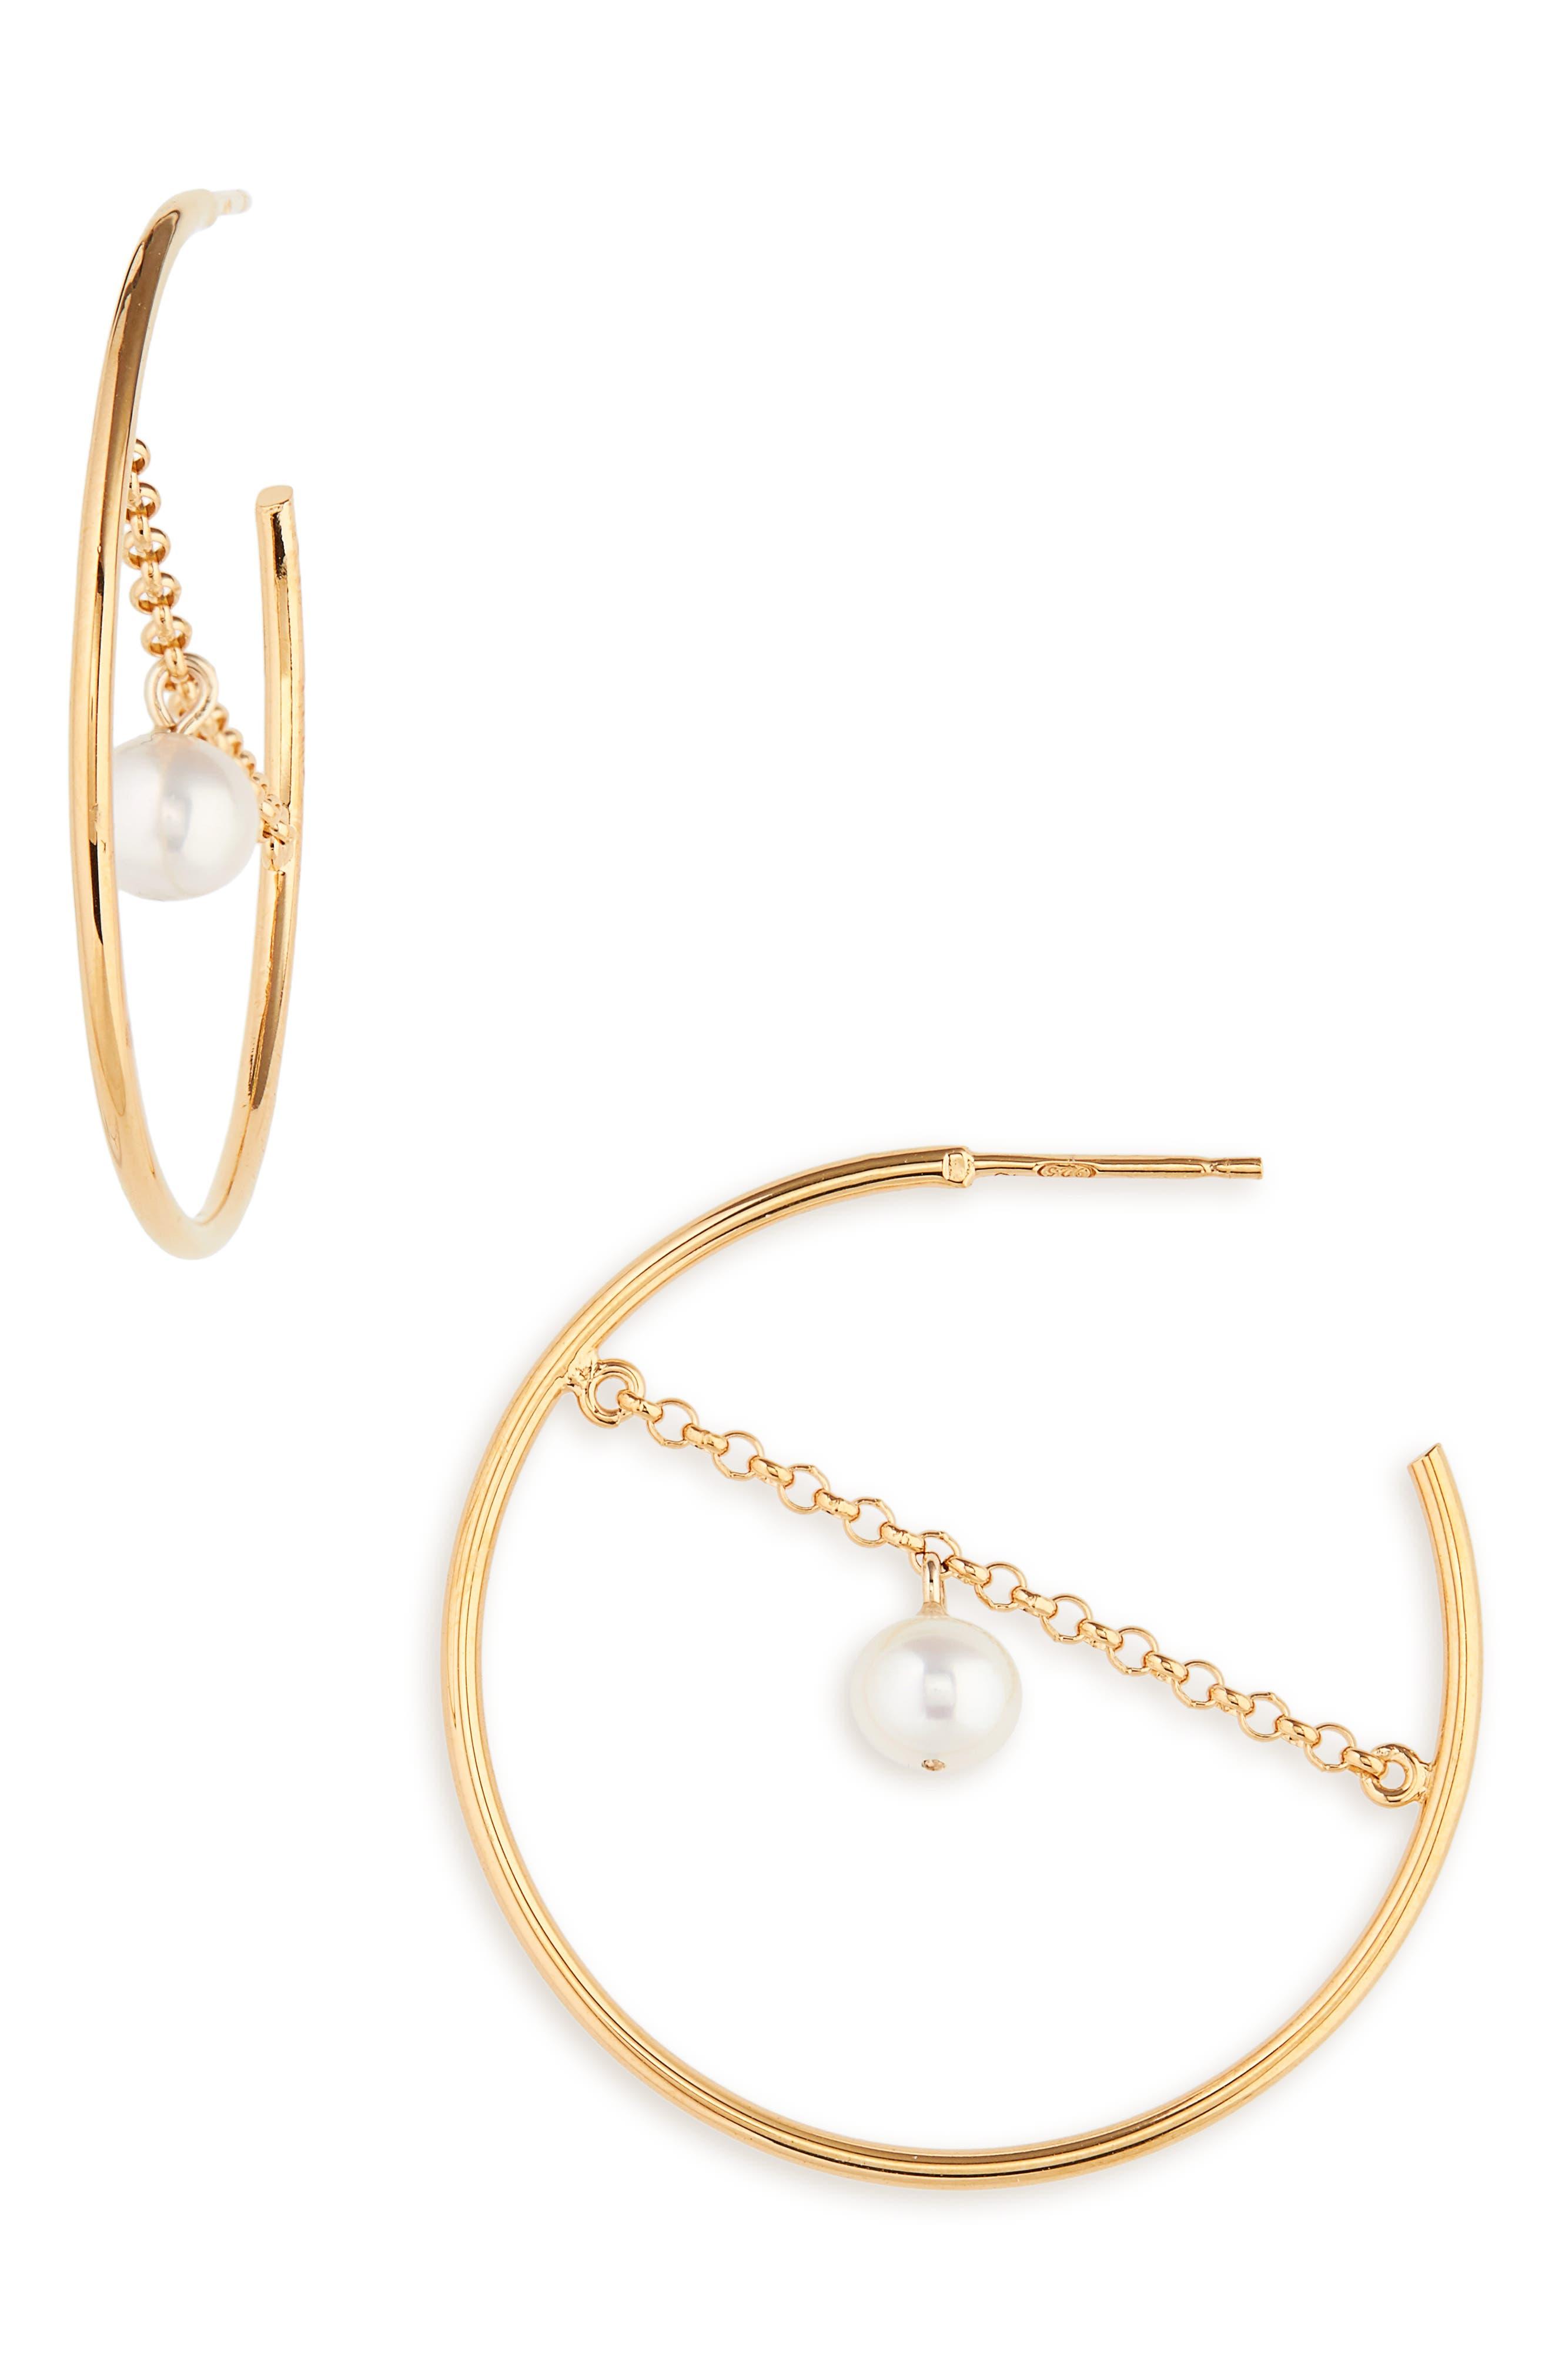 Selene Freshwater Pearl Hoop Earrings,                         Main,                         color, GOLD PLATED STERLING SILVER